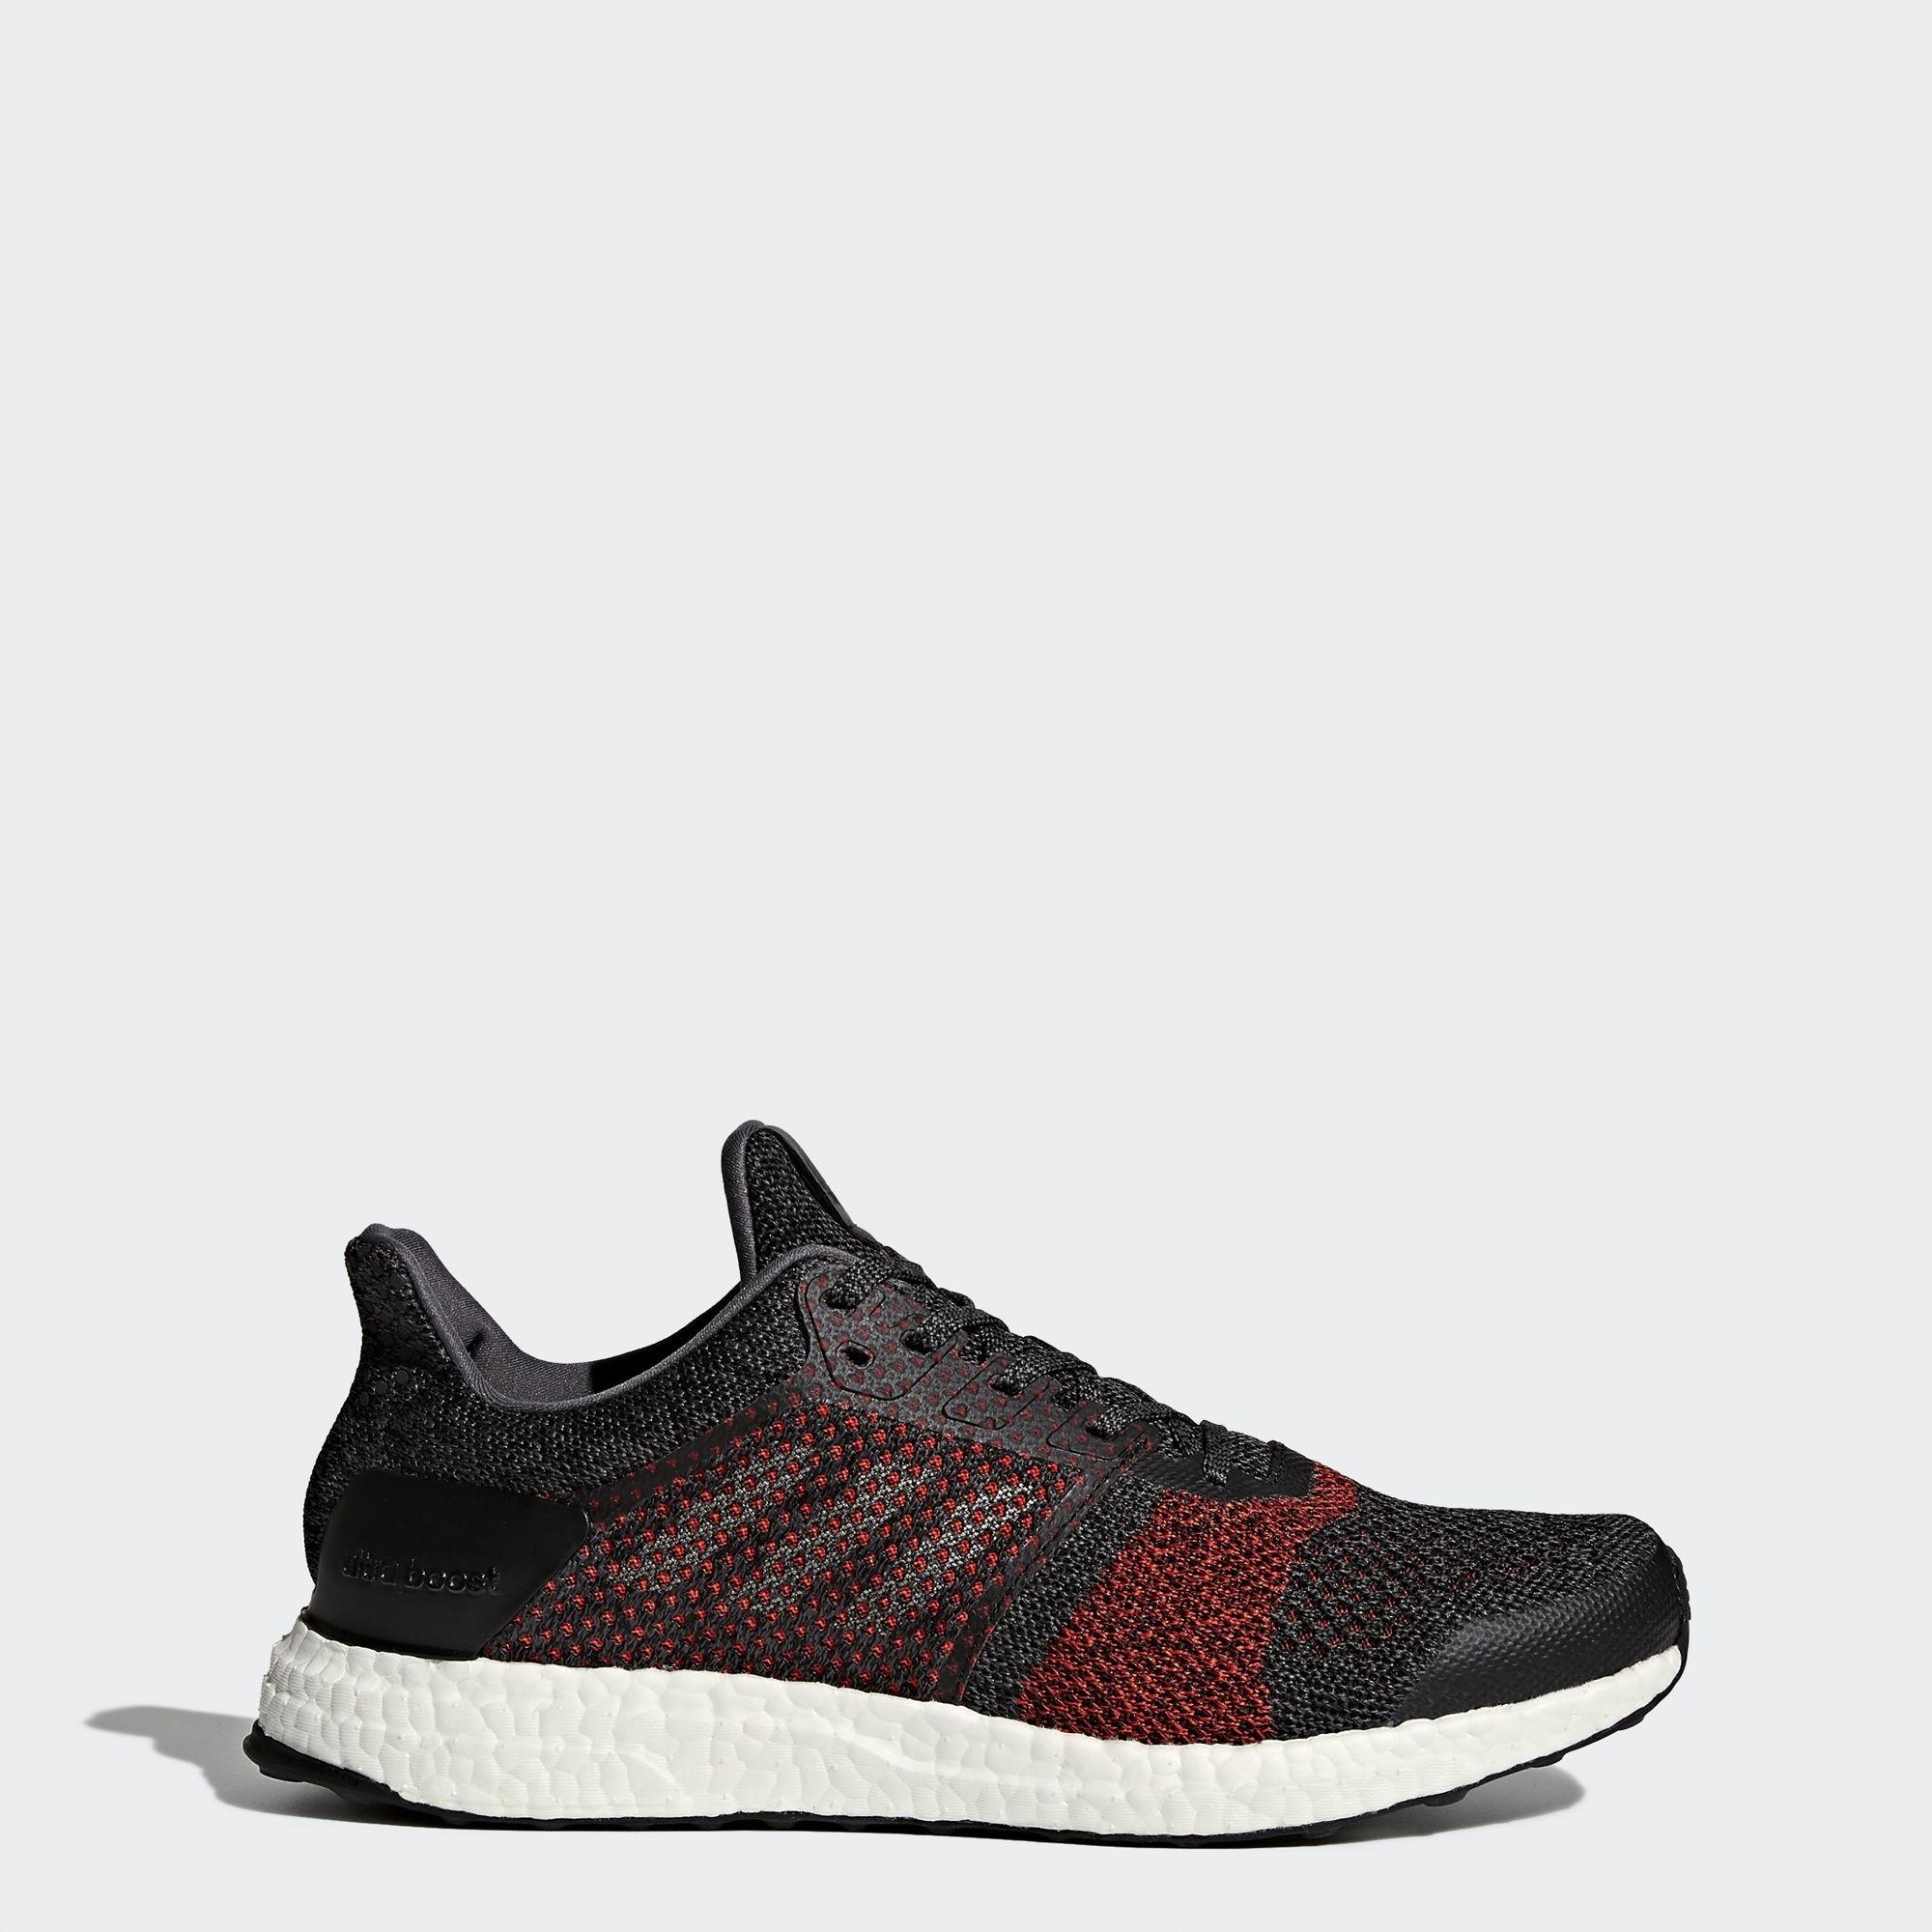 Adidas Ultra Boost ST Hombre Corriendo Zapatilla Negras/Rojas S80616